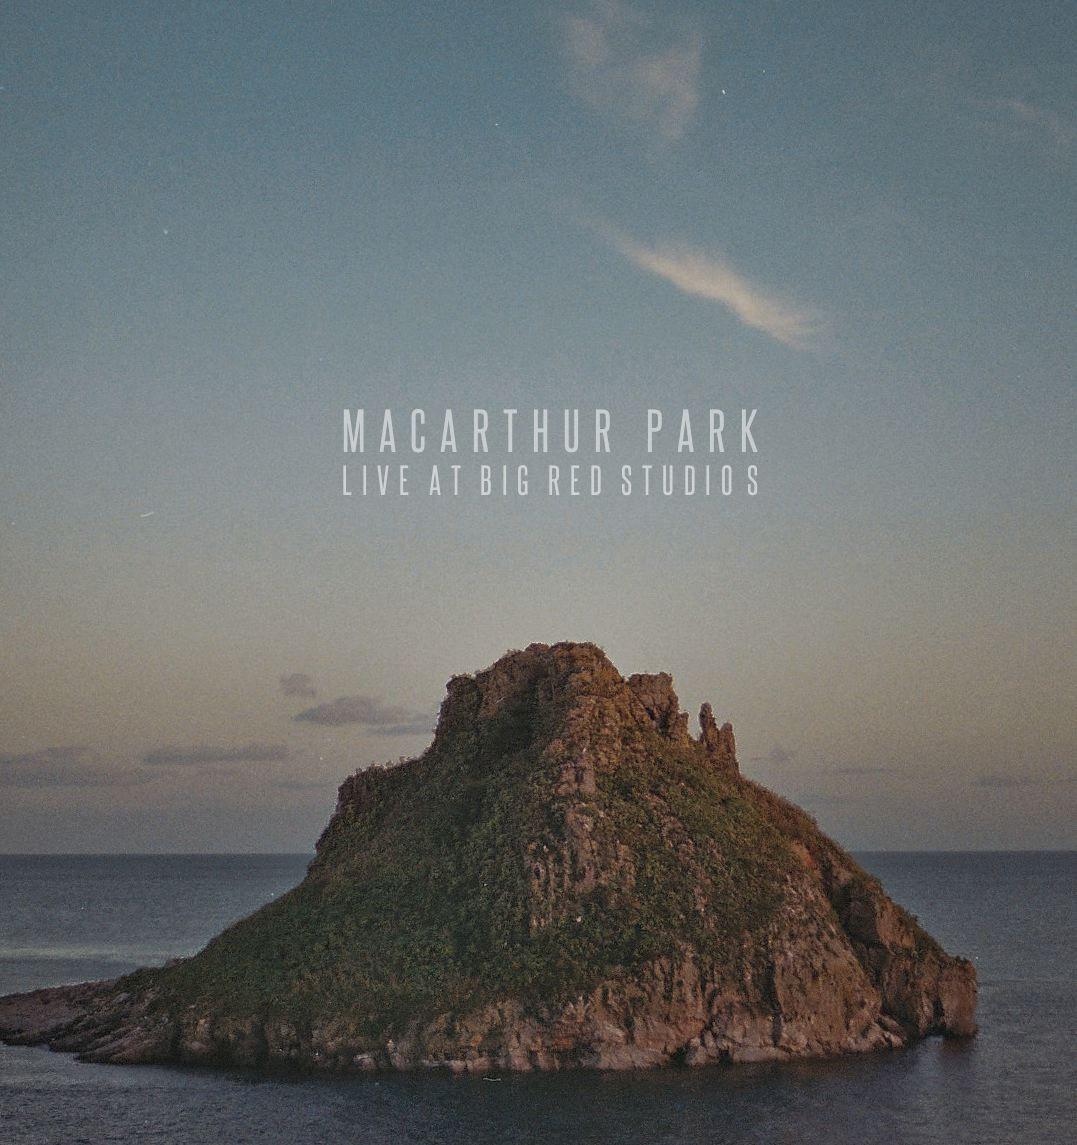 Live at Big Red Studios | MacArthur Park